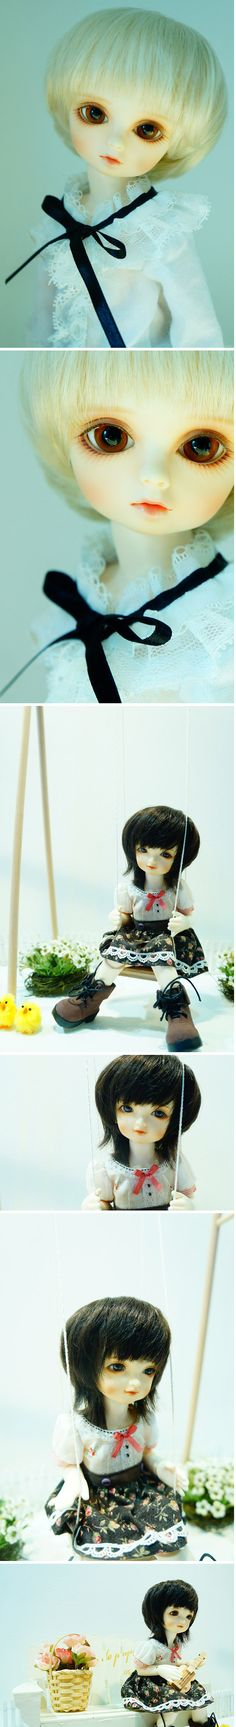 http://dorothy-doll.com/